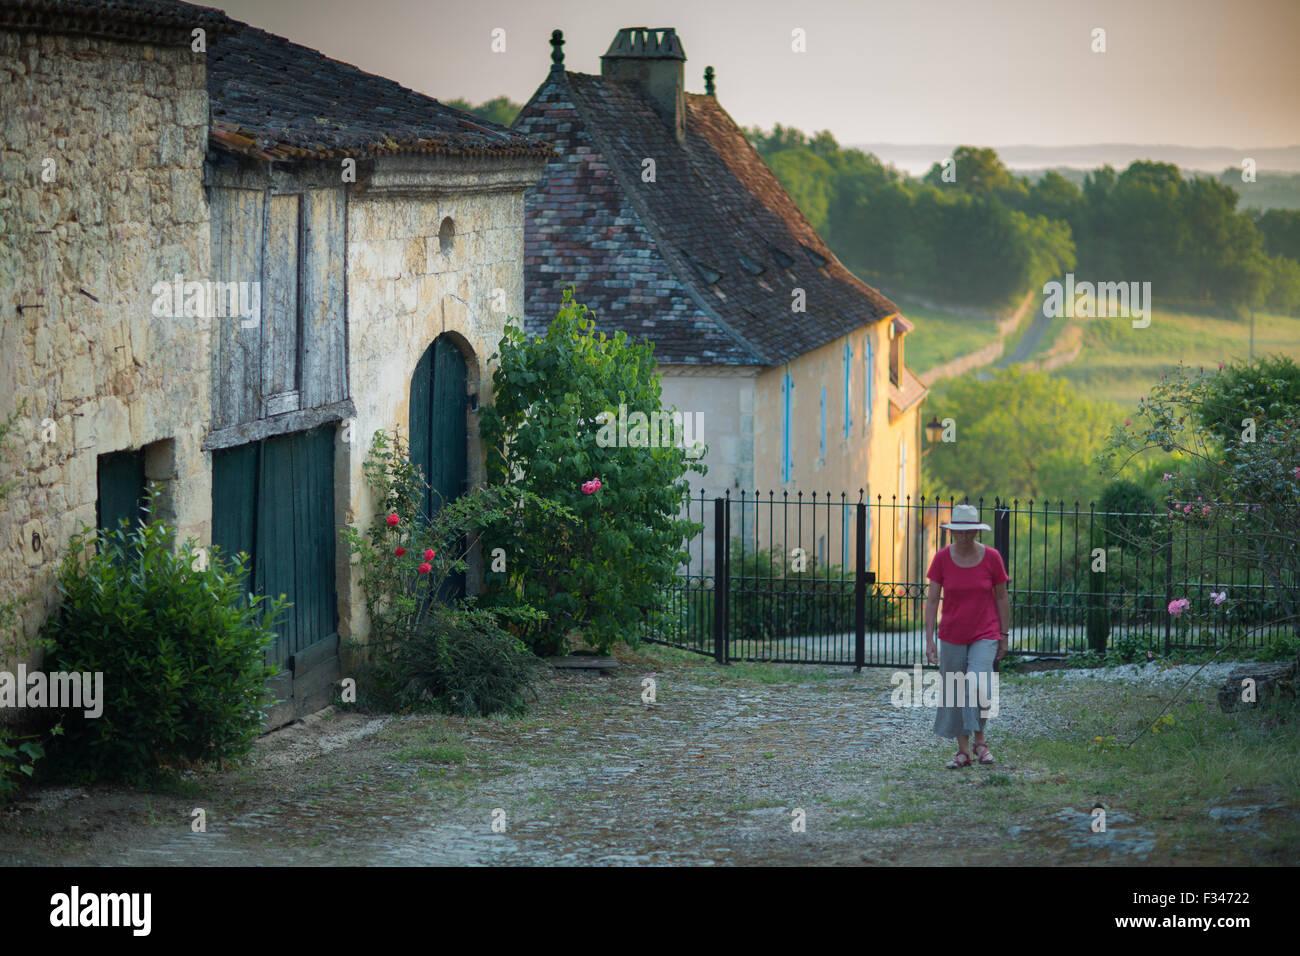 Wendy walking in a lane in Molières, Pays de Bergerac, Périgord, Dordogne, Aquitaine, France Stock Photo